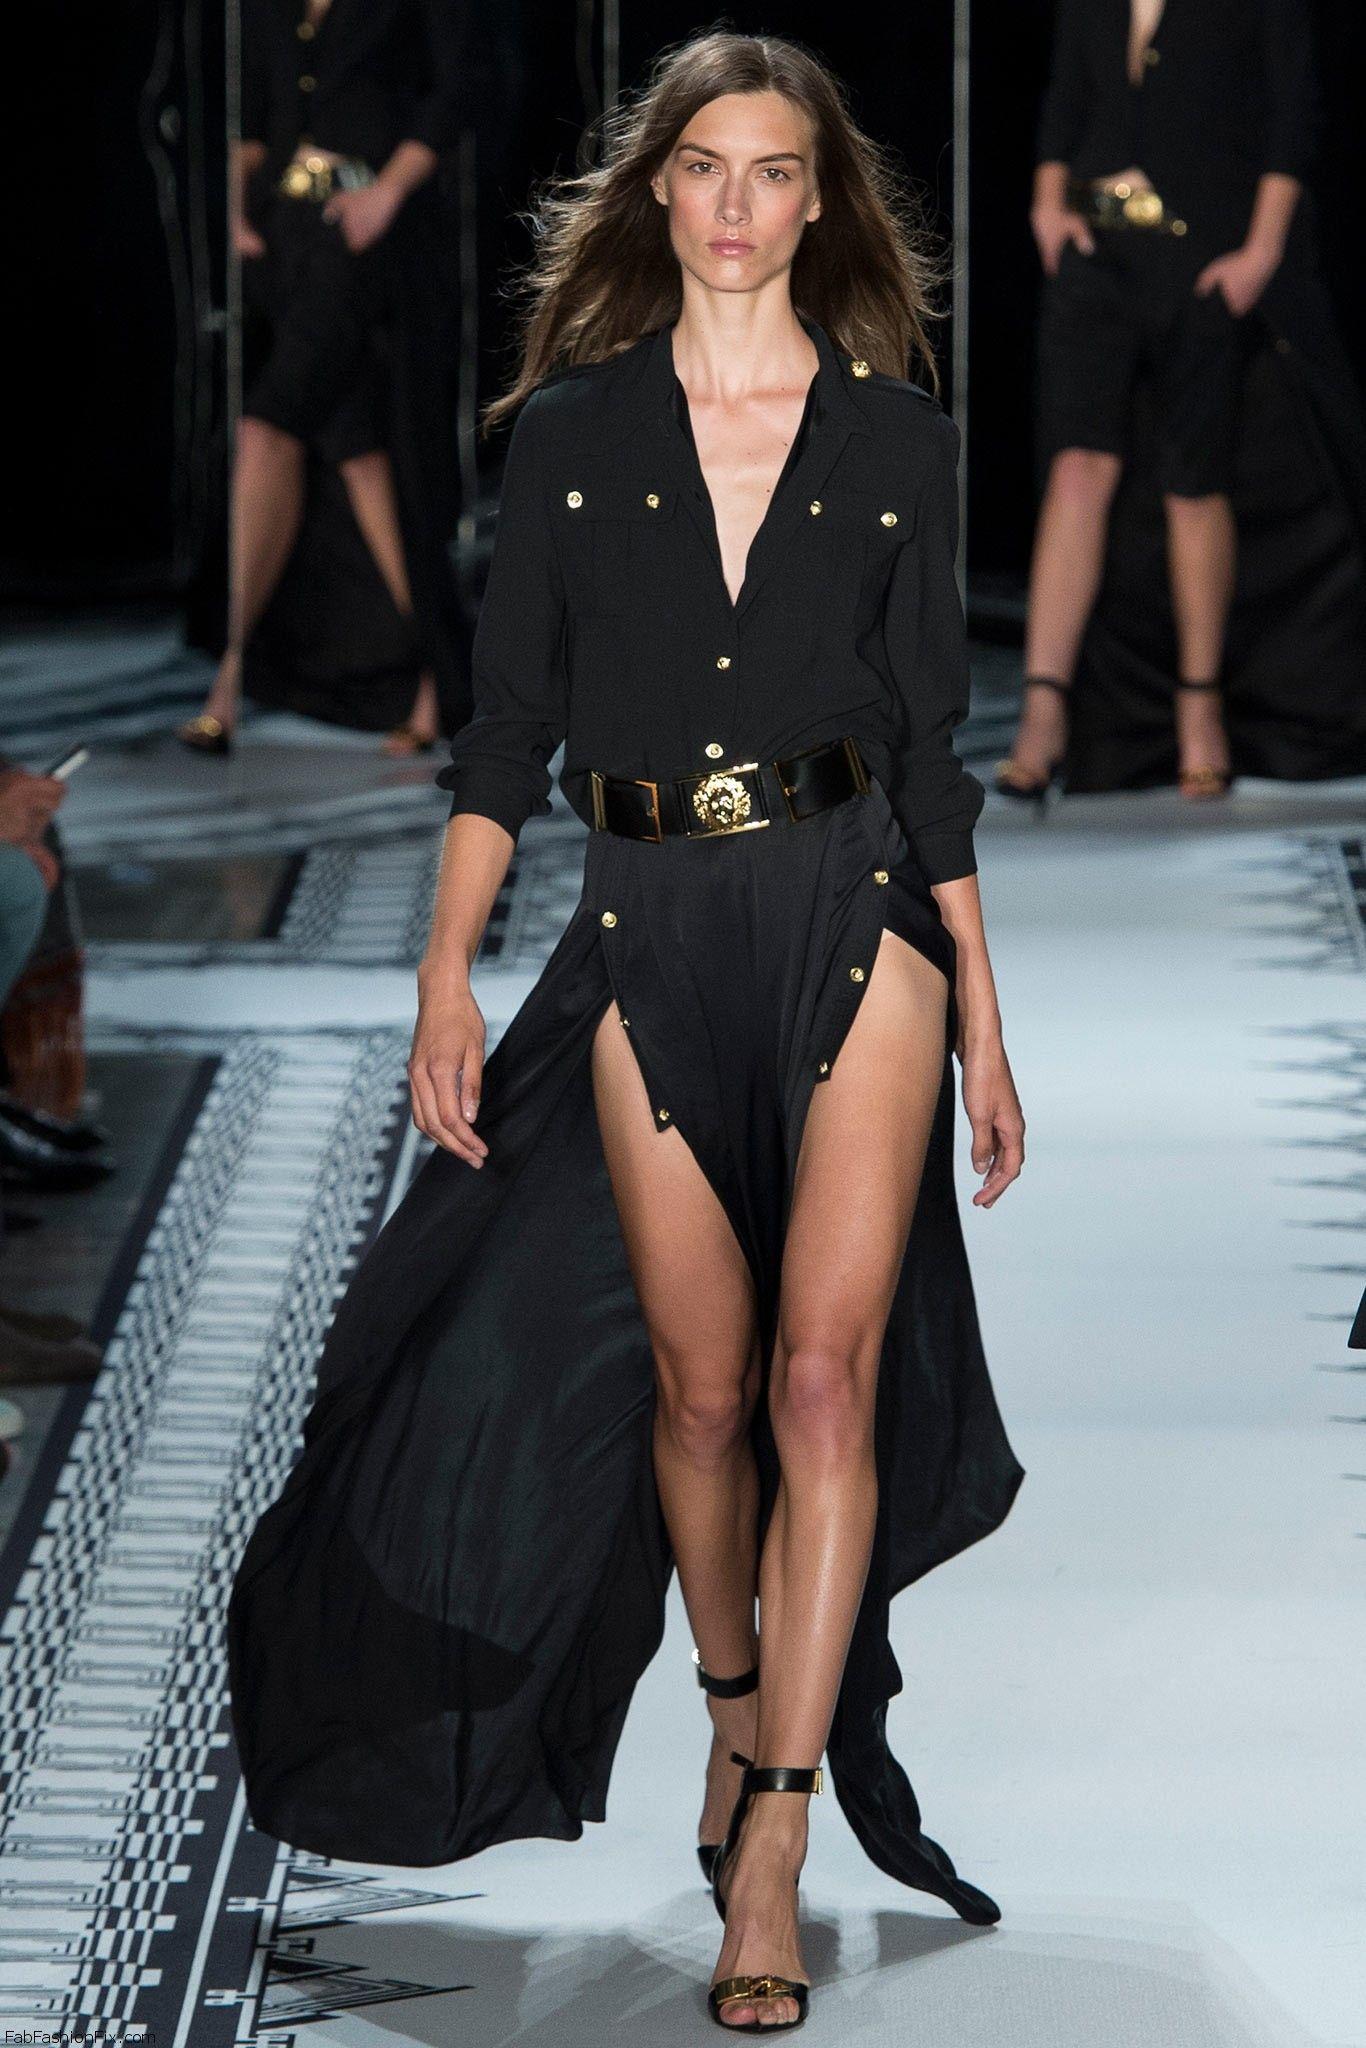 Versus Versace spring/summer 2015 collection - New York fashion week